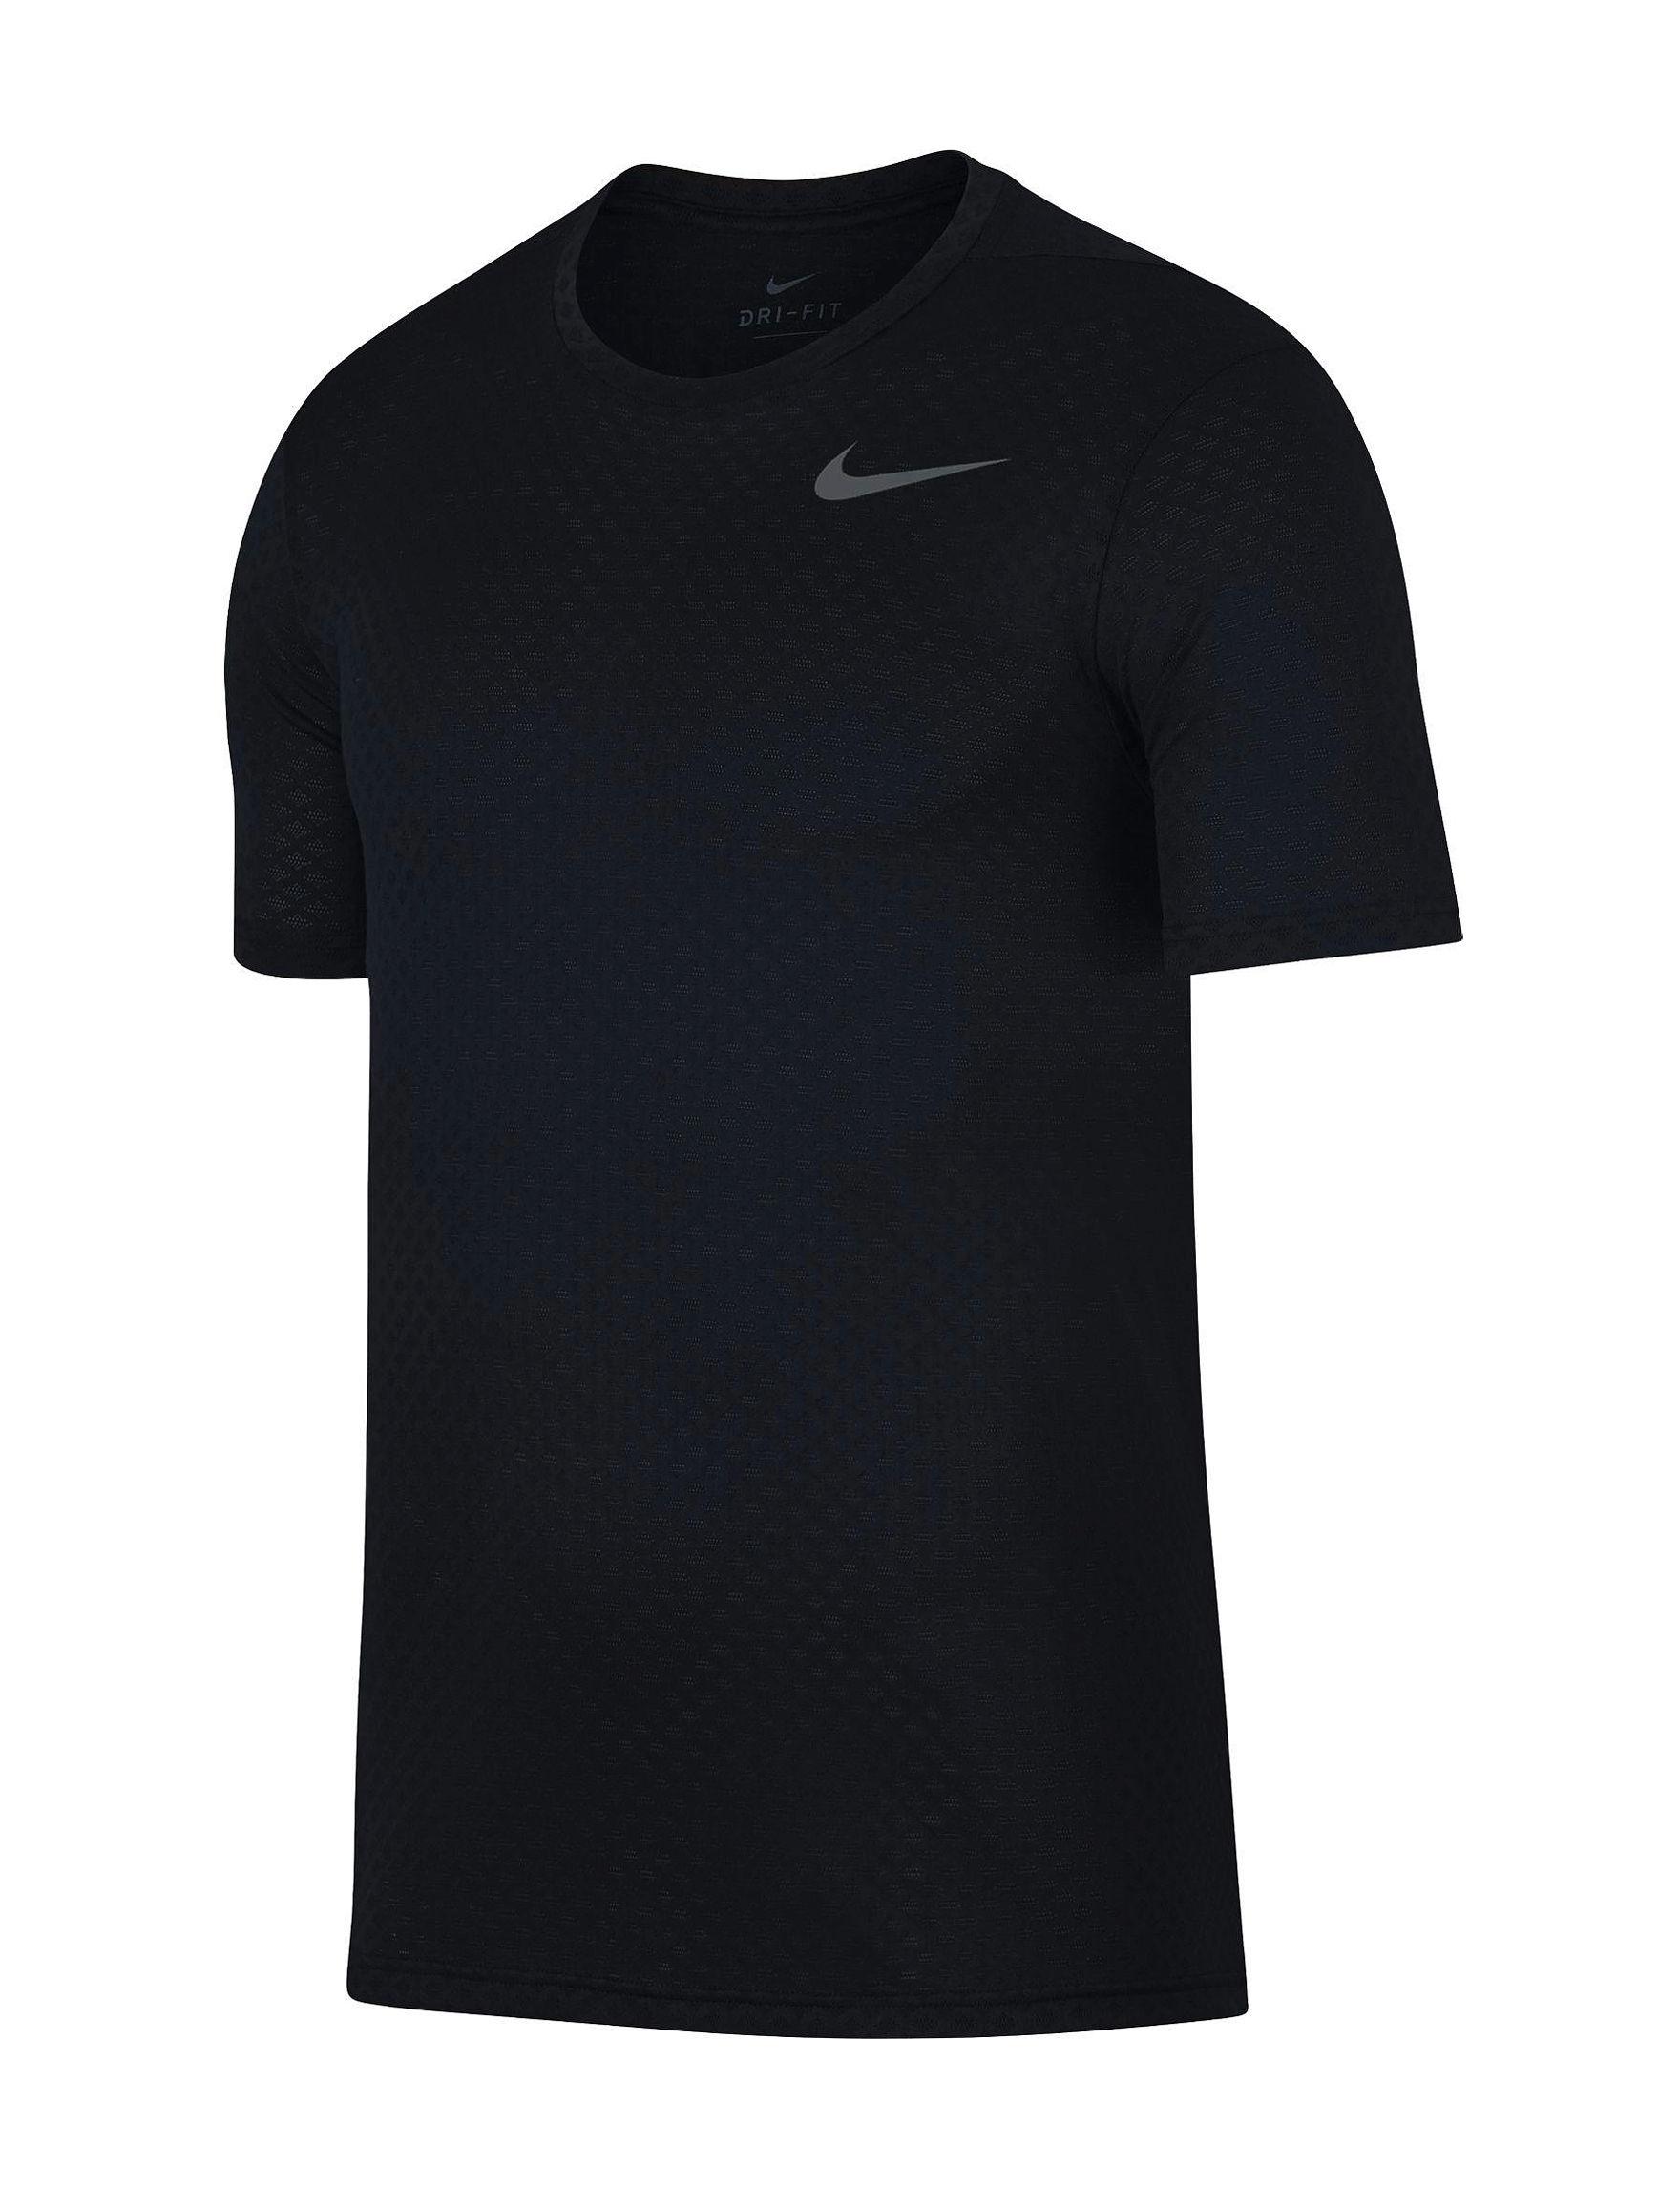 Nike Black / Grey Tees & Tanks